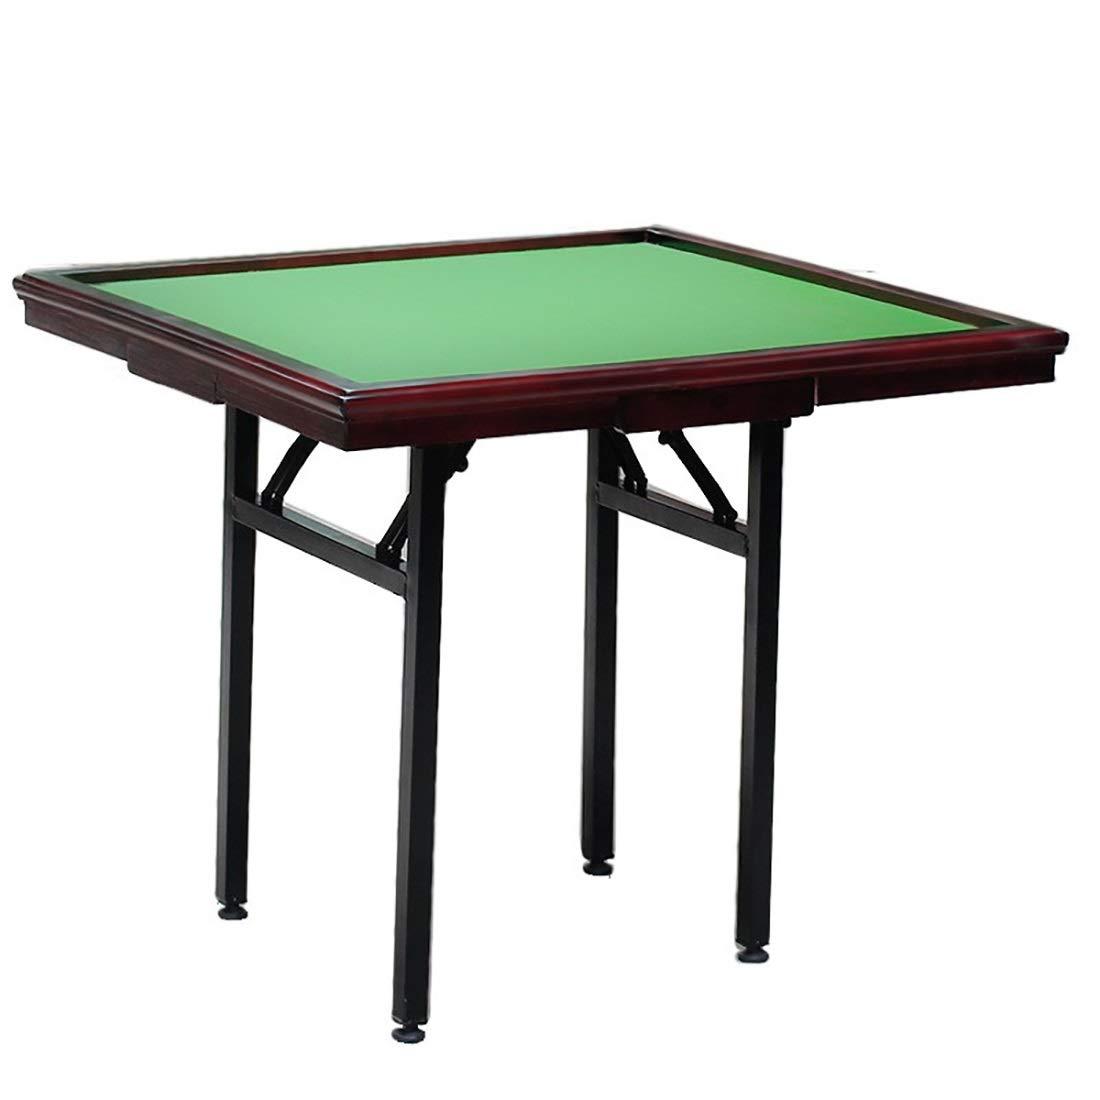 caliente Caoba NuoEn Mahjong Table, Poker, Juegos de de de Cochetas, Juegos de Mesa, Juegos de fichas, Dominó, Poker Table Wooden (Color   Oak Wood)  precios bajos